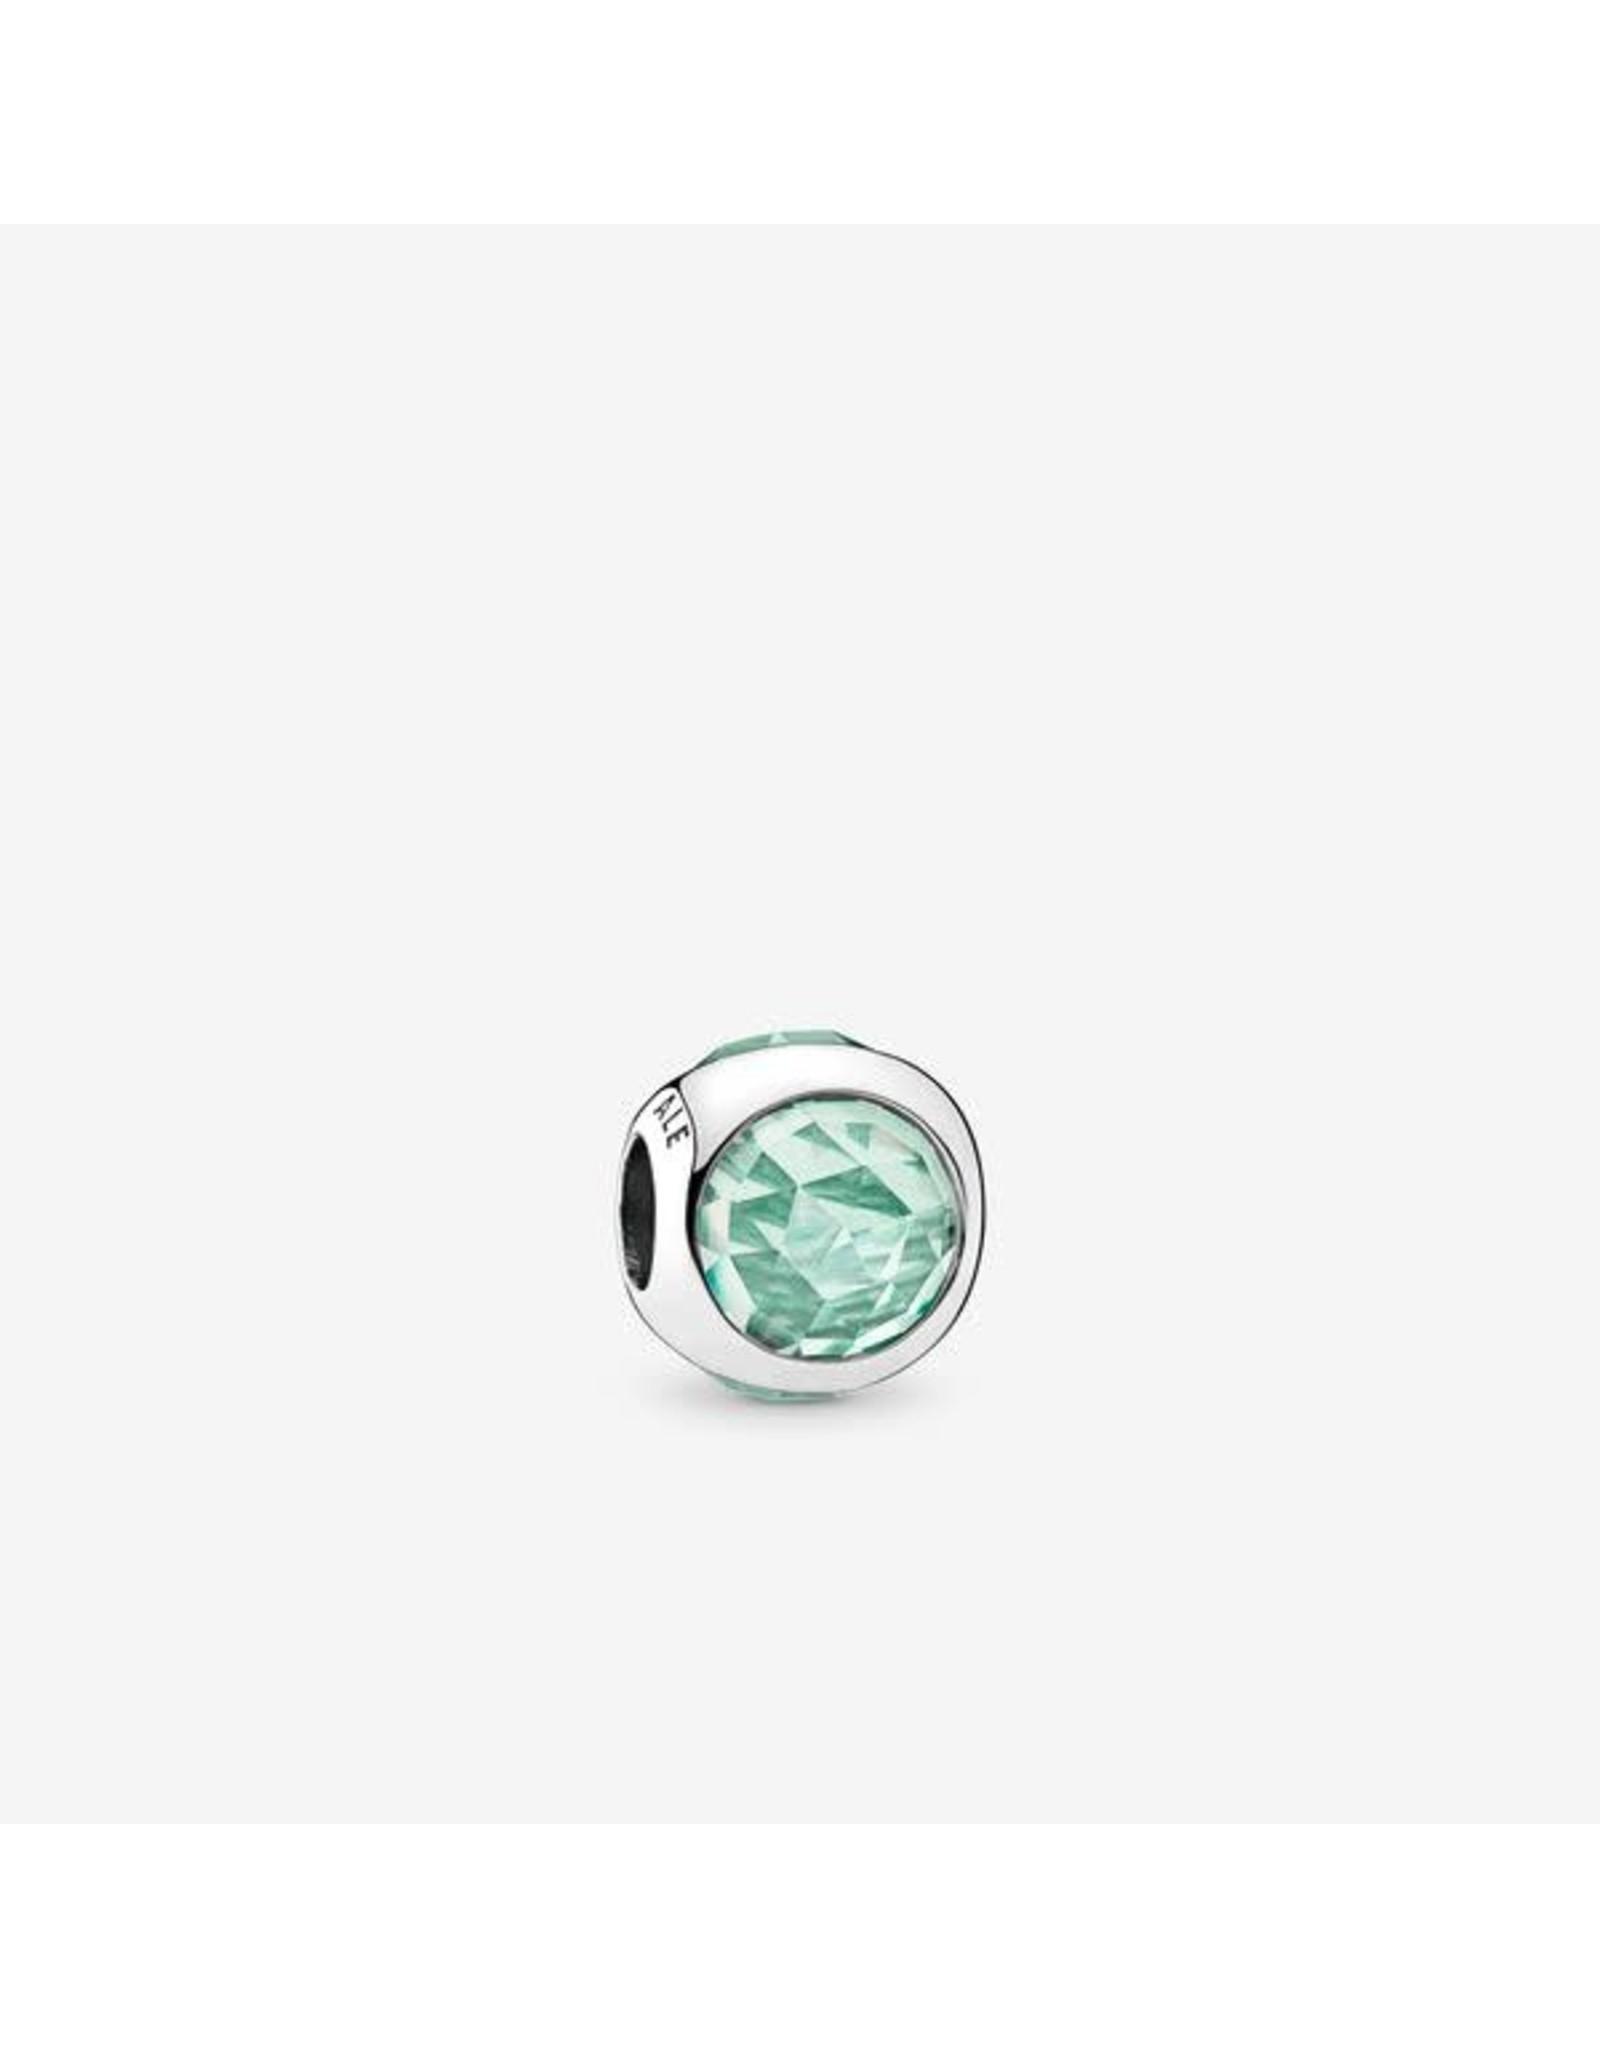 Pandora Pandora Charm,Radiant Droplet, Icy Green Crystals